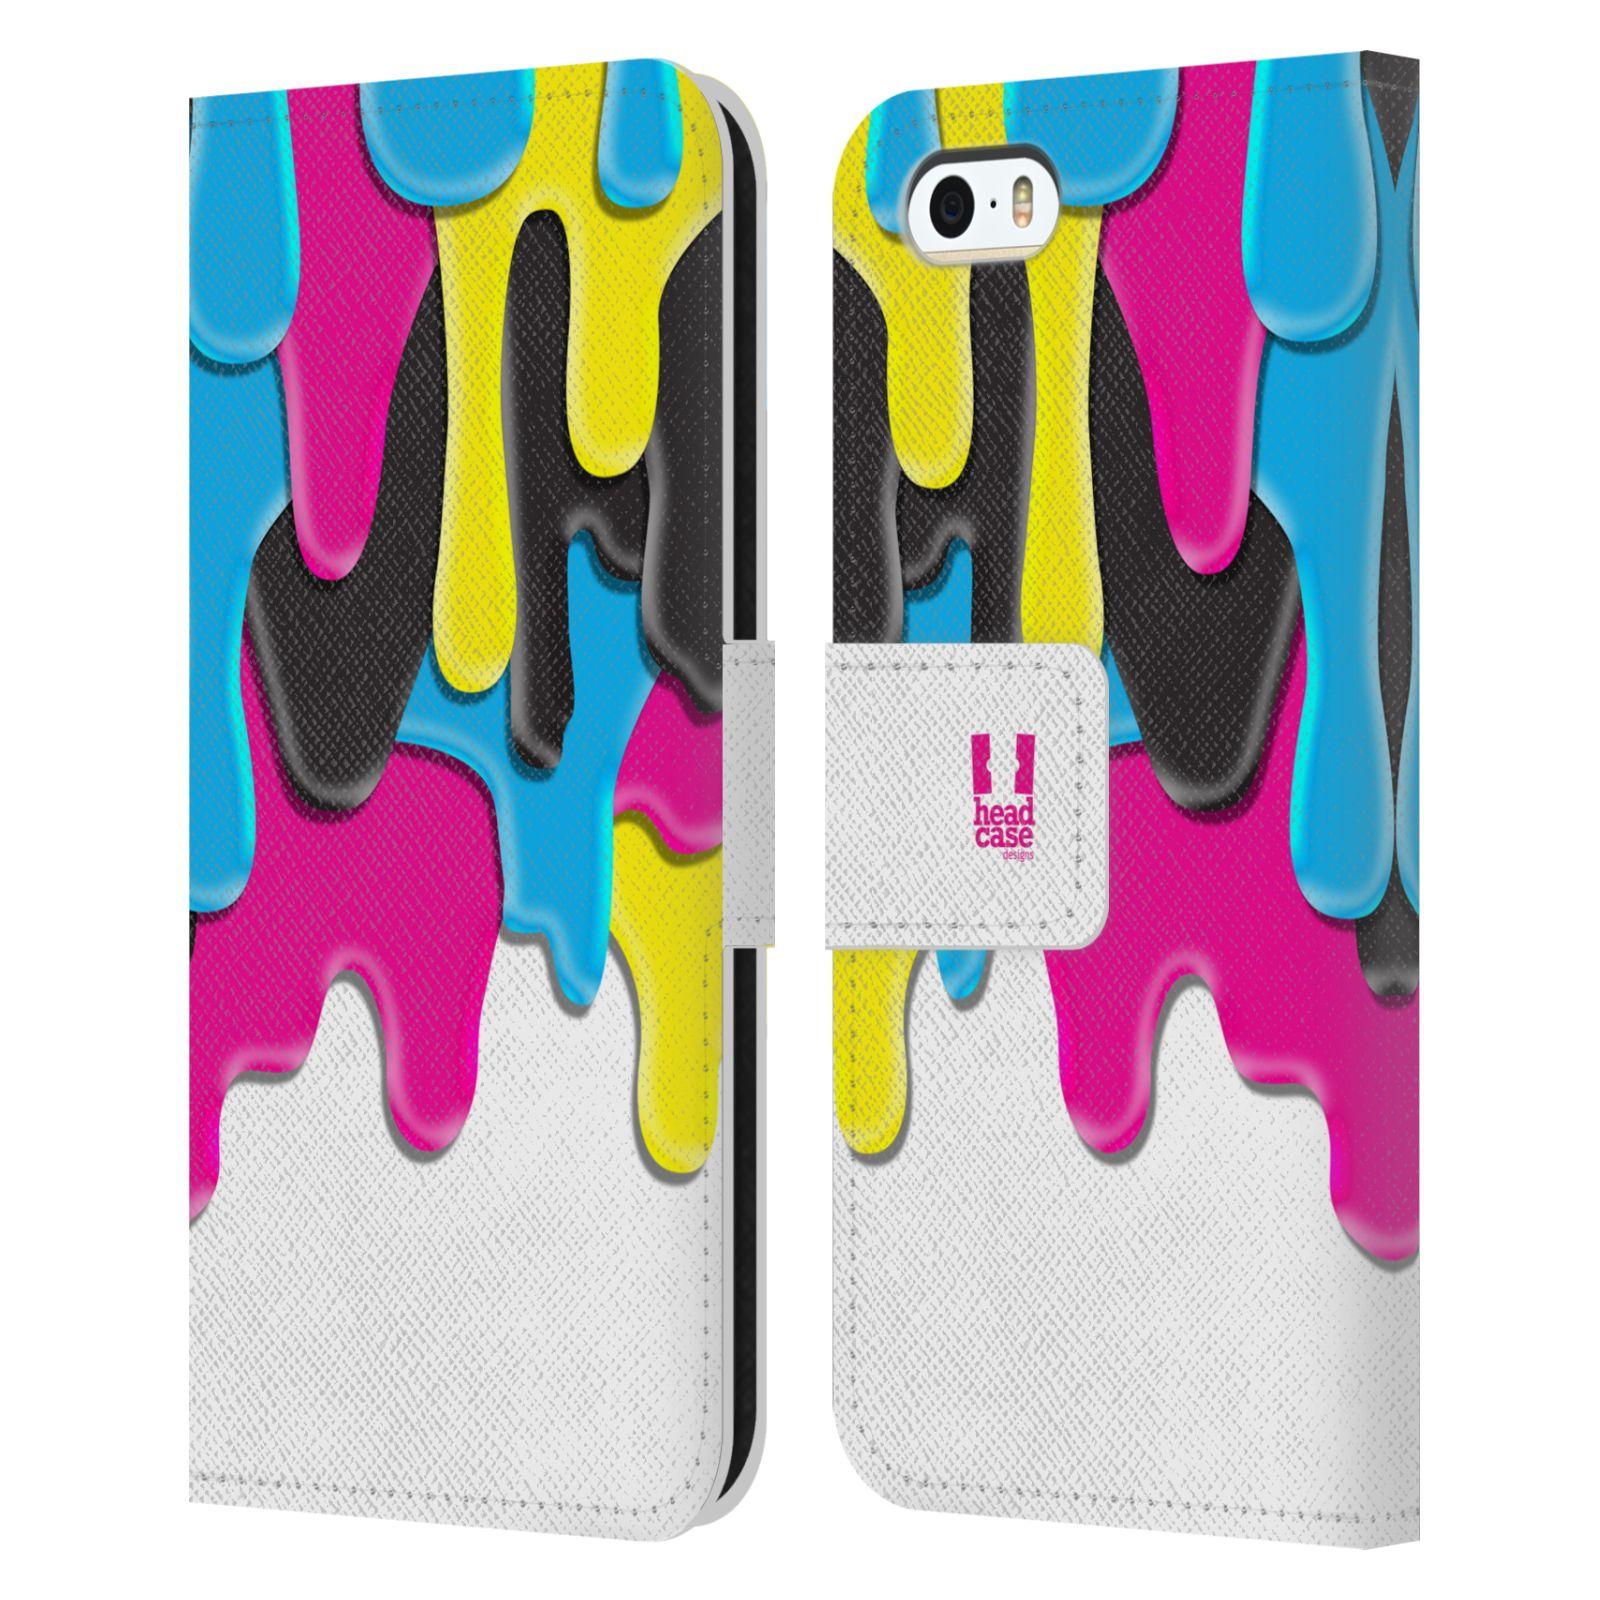 HEAD CASE Flipové pouzdro pro mobil Apple Iphone 5/5s ZÁPLAVA BARVA MIX barev